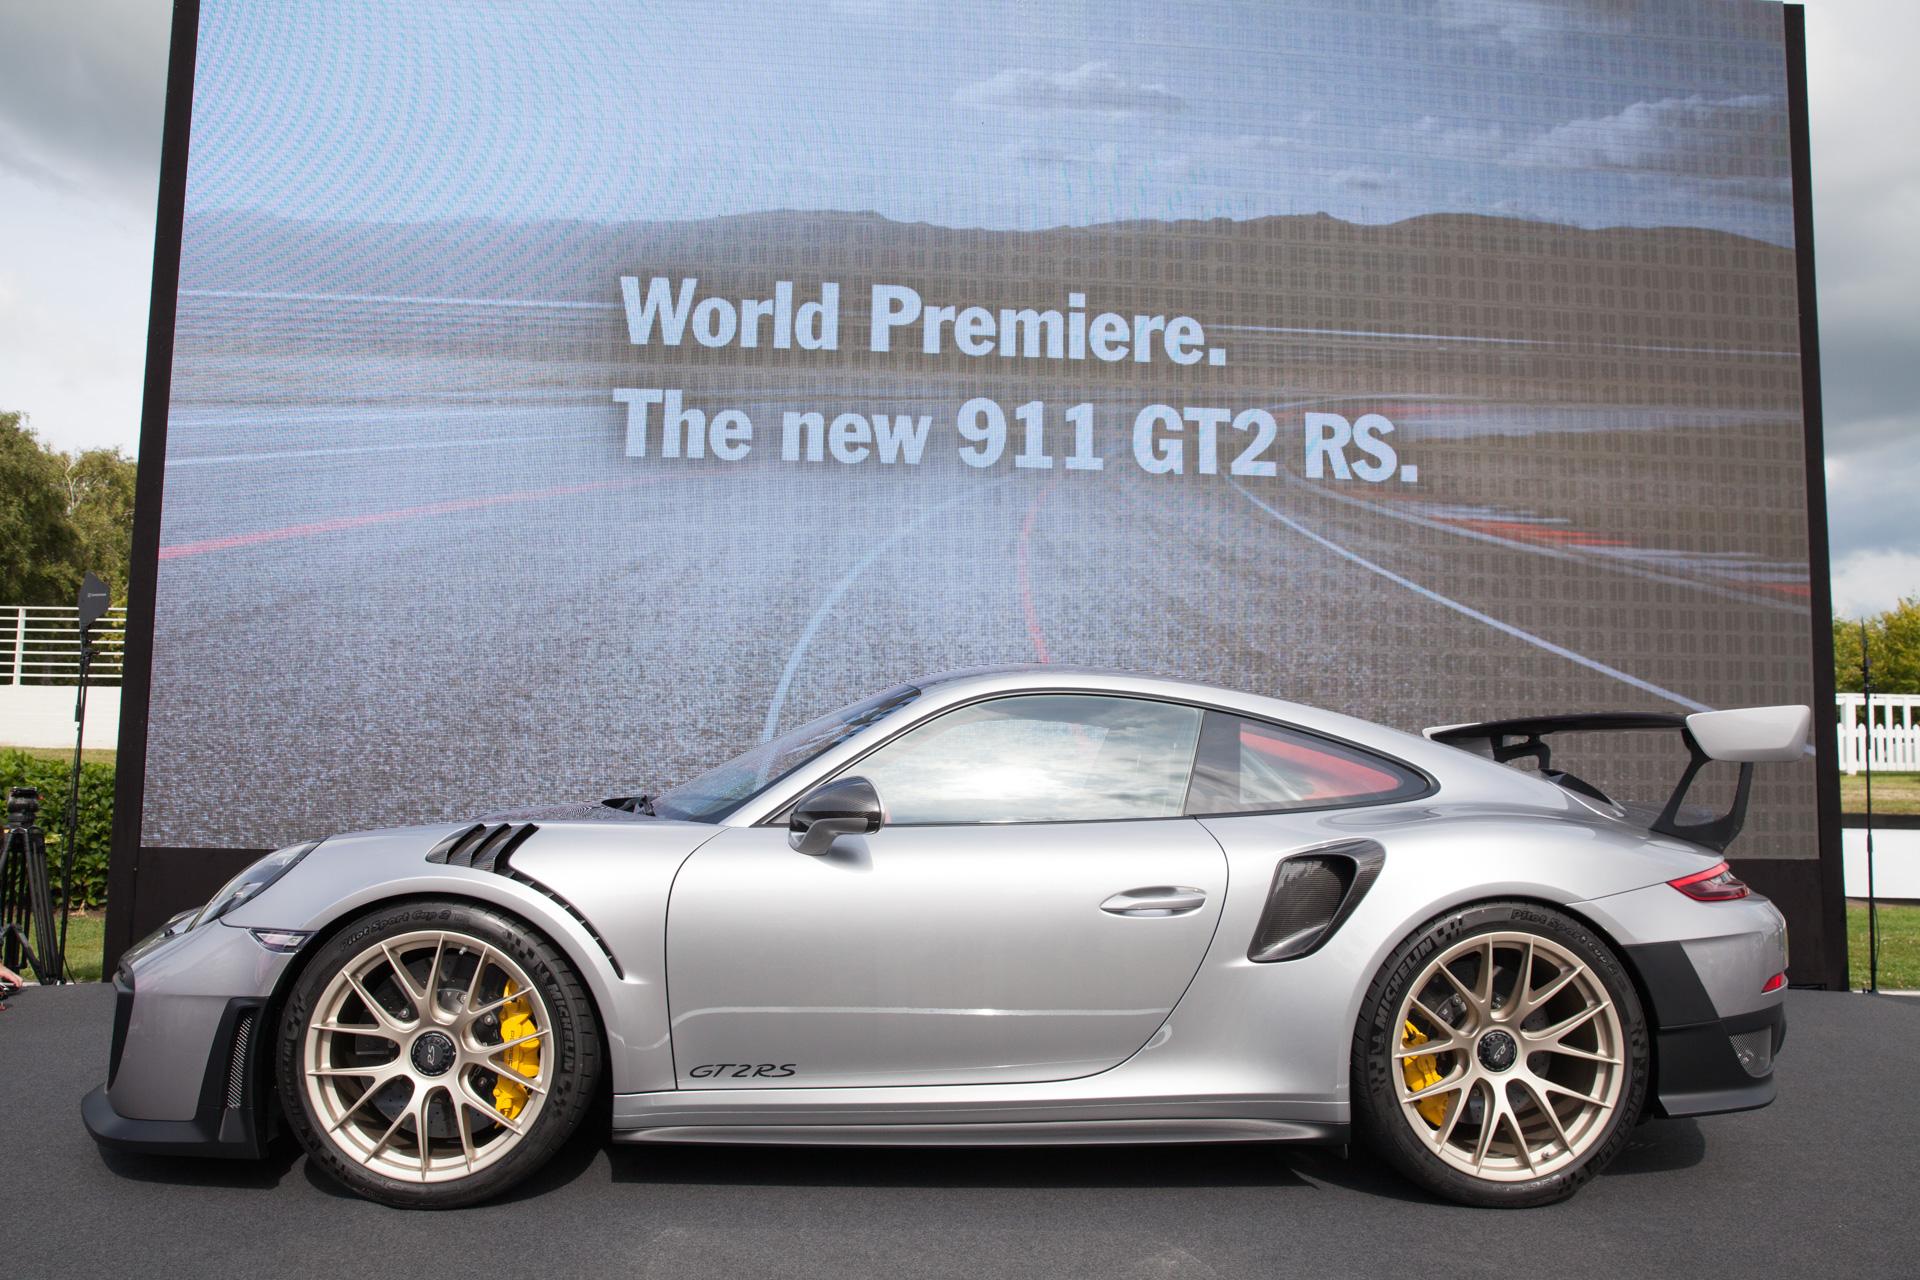 2018-porsche-911-carrera_100612444_h Terrific 2002 Porsche 911 Carrera Turbo Gt2 X50 Cars Trend